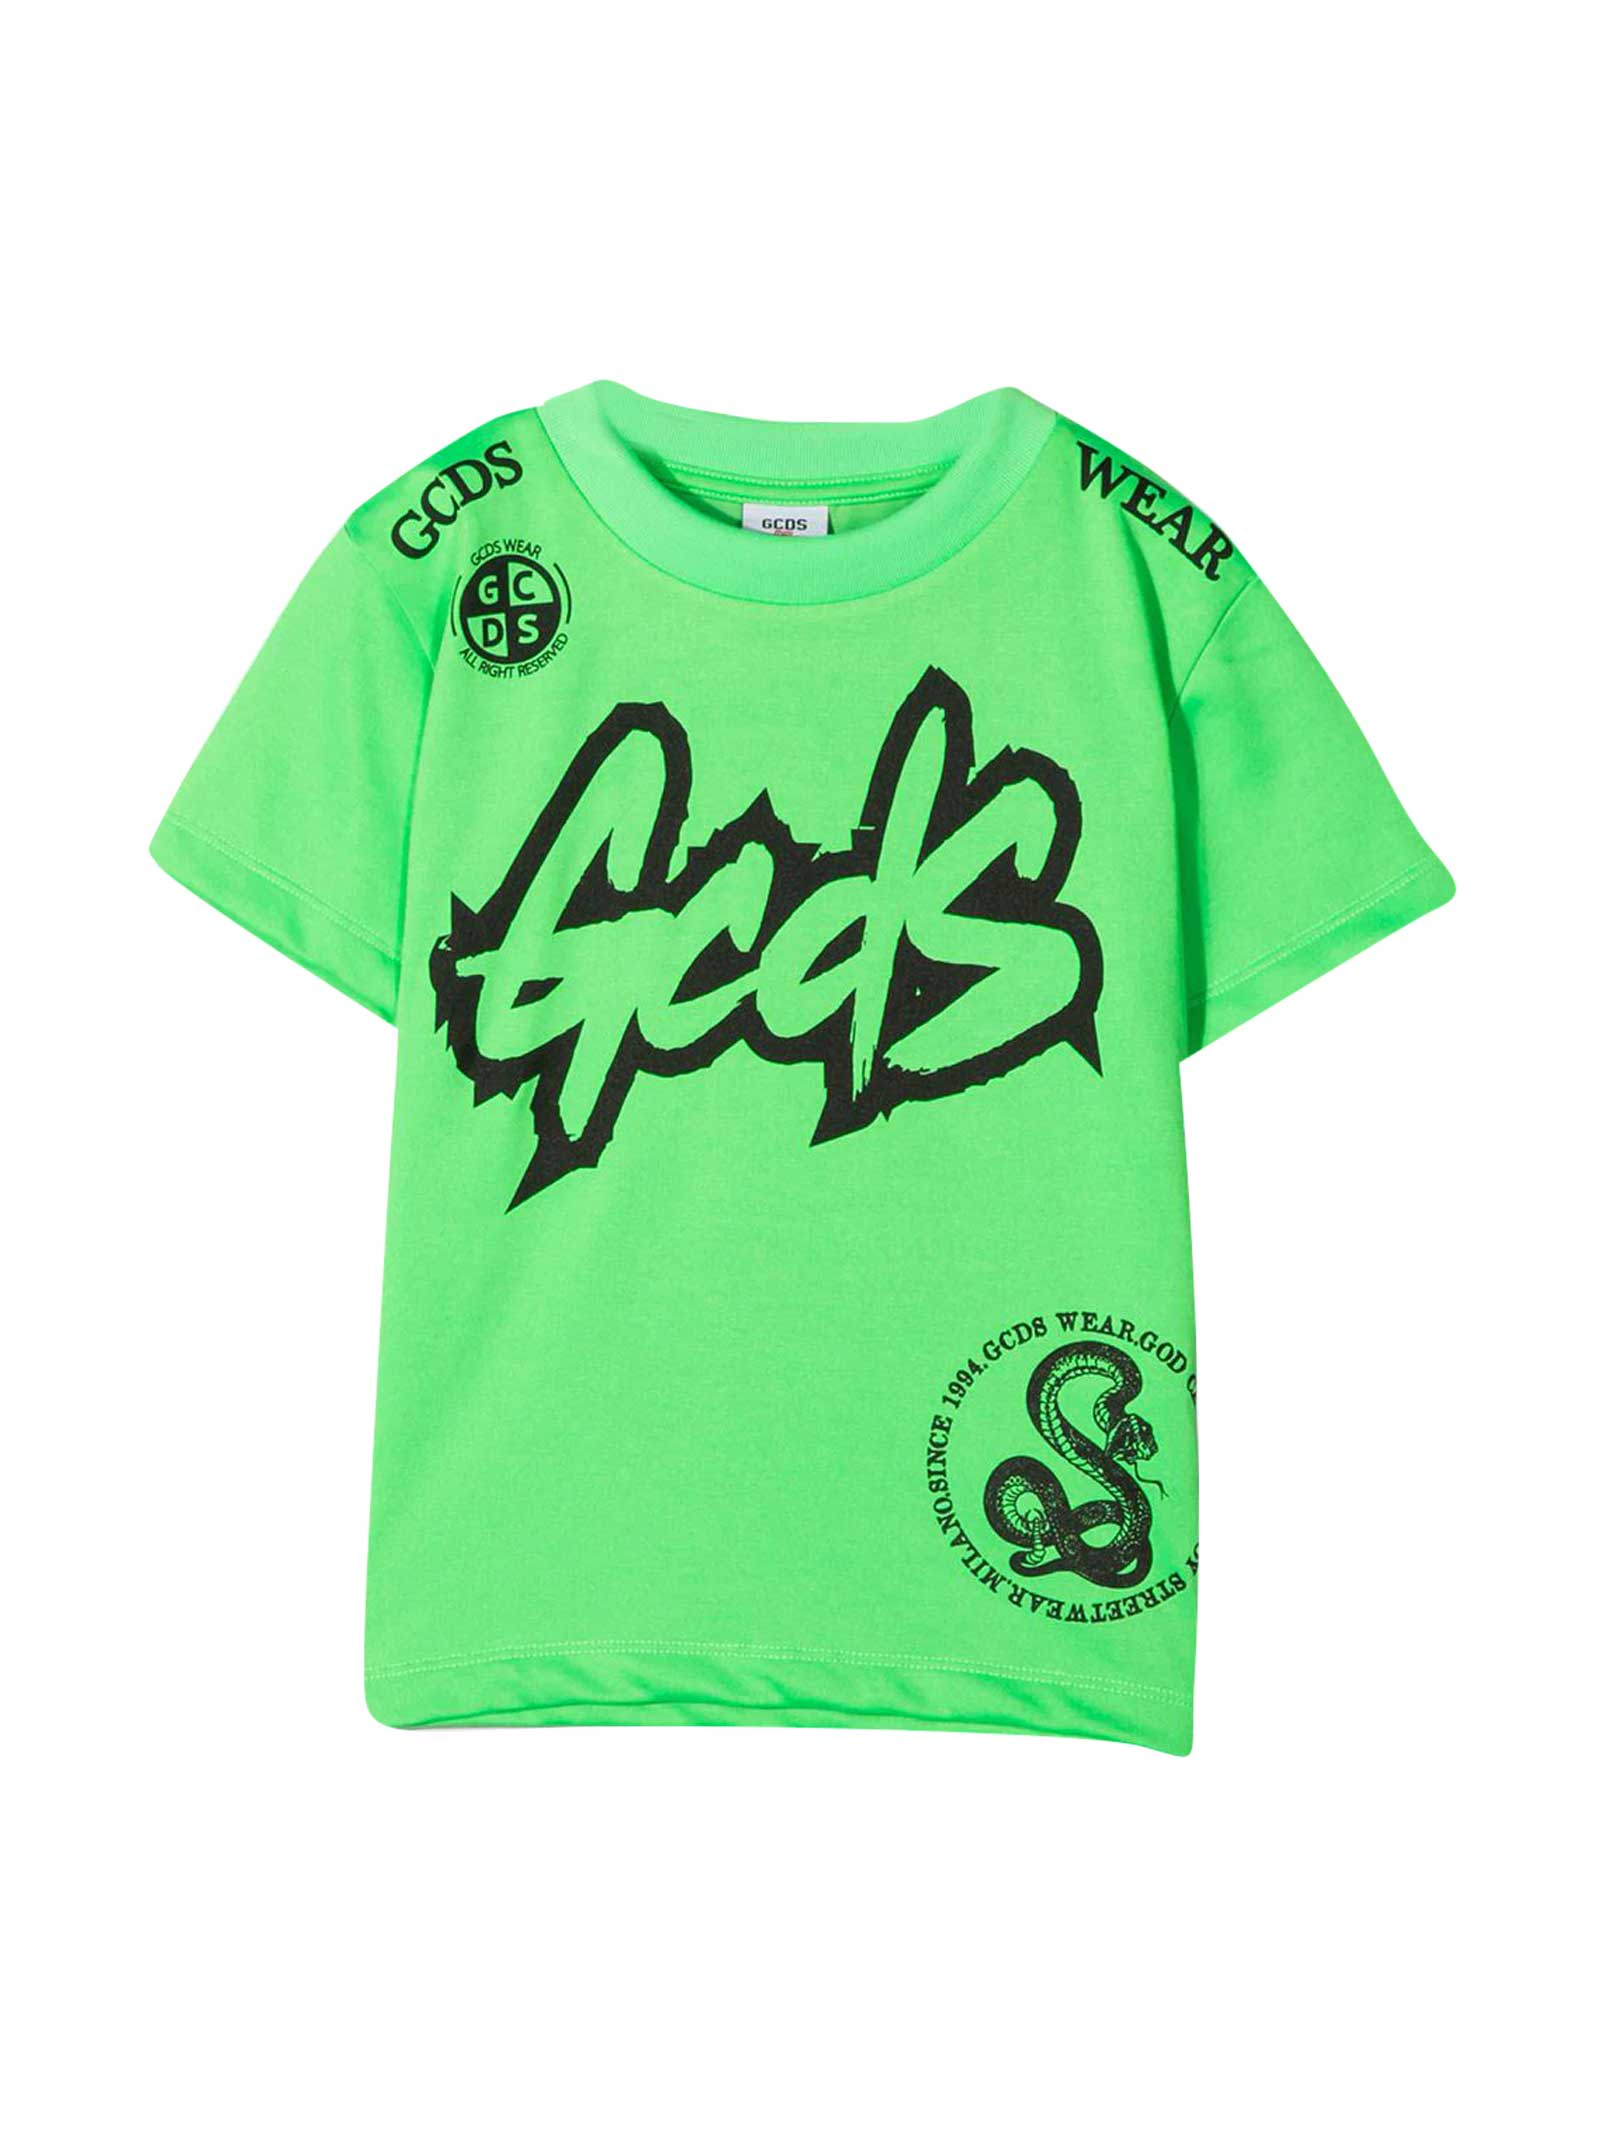 Gcds Mini GREEN TEEN T-SHIRT